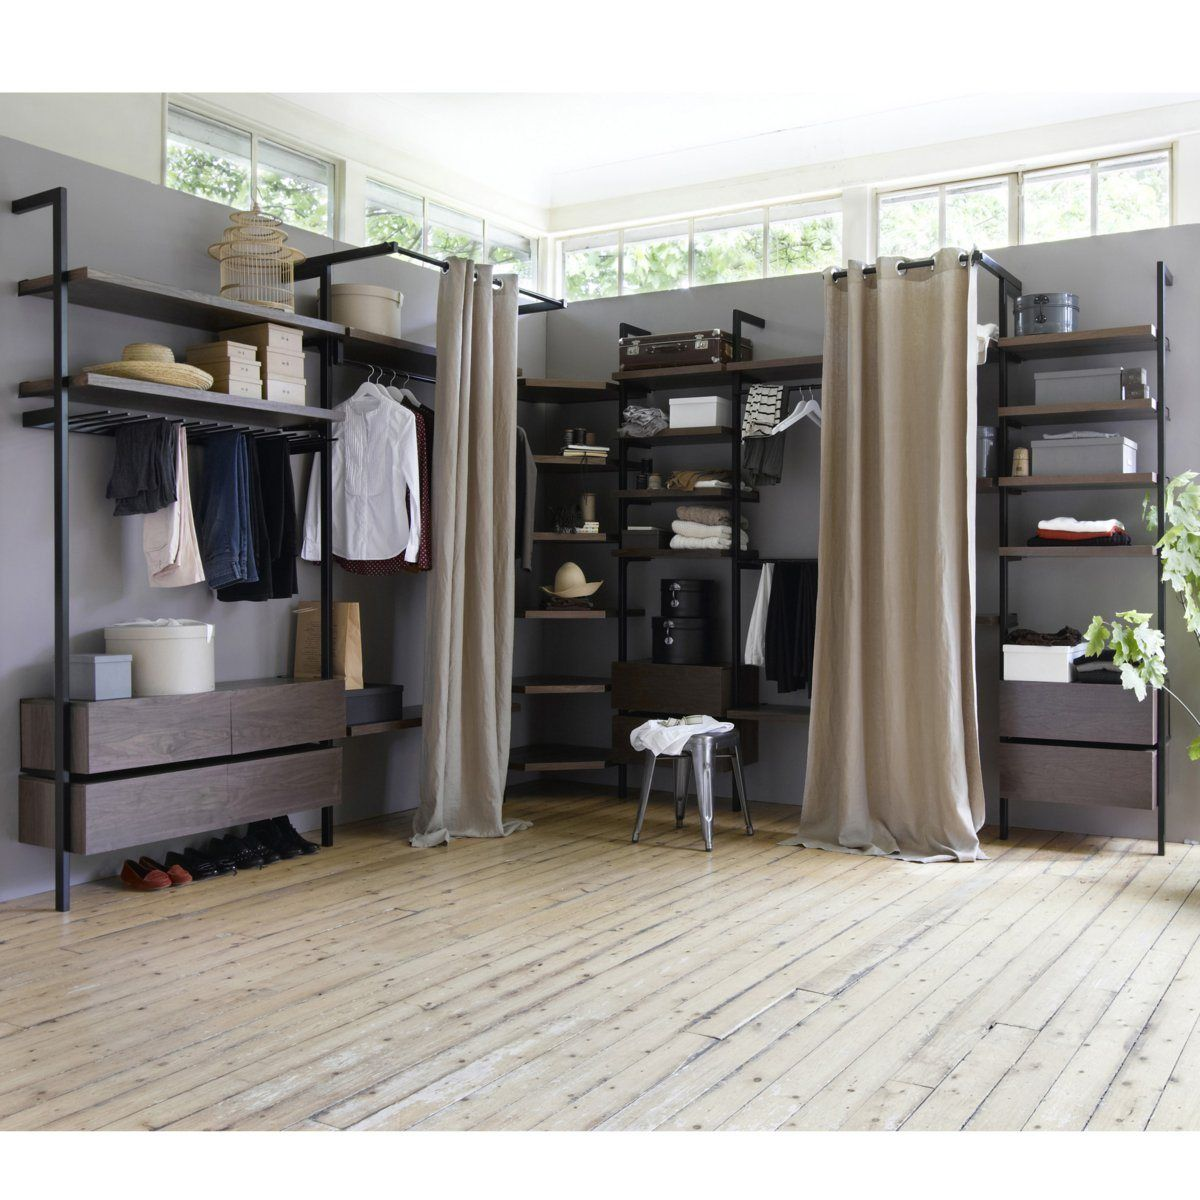 Joli dressing contemporain | Inside | Pinterest | Dressing room ...